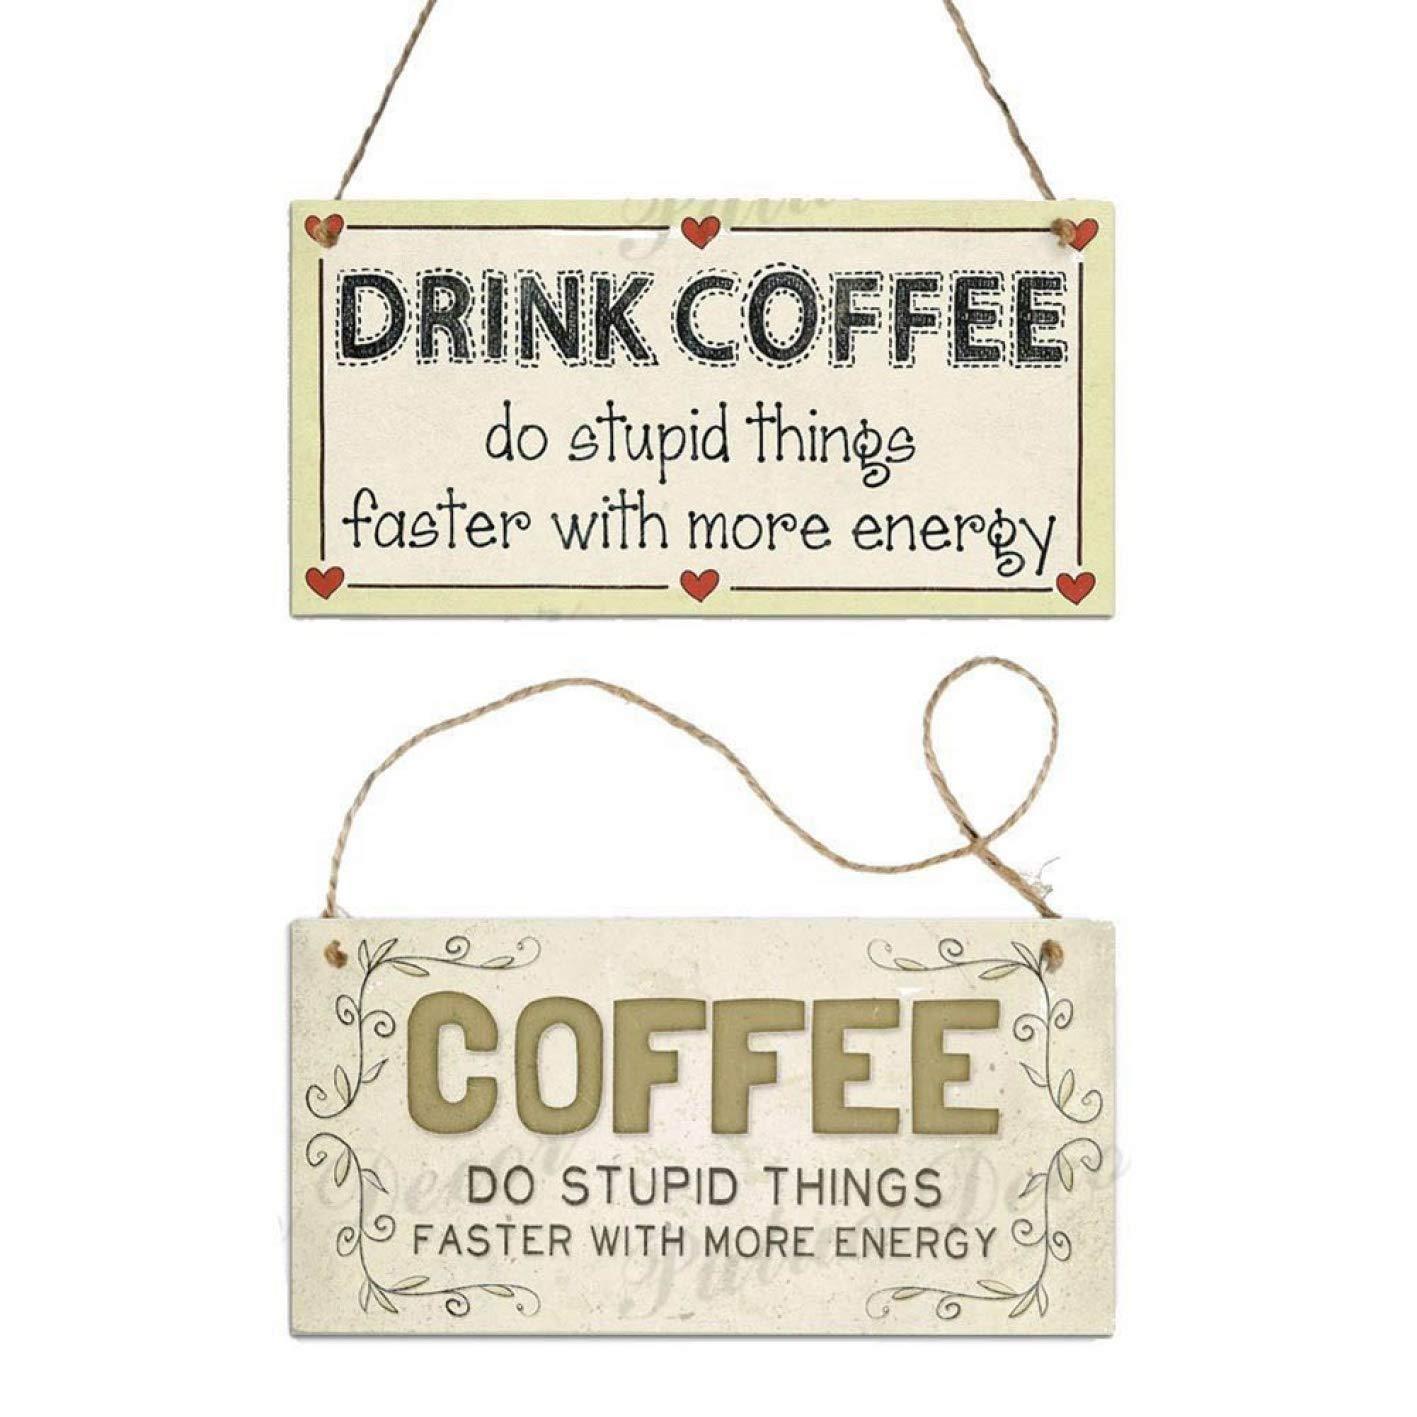 tianshi Simple 7.8 x 3.9 Pulgadas 12 Tipos de letreros de caf/é de Madera para Colgar Placas Regalo hogar Cocina Barra de caf/é decoraci/ón